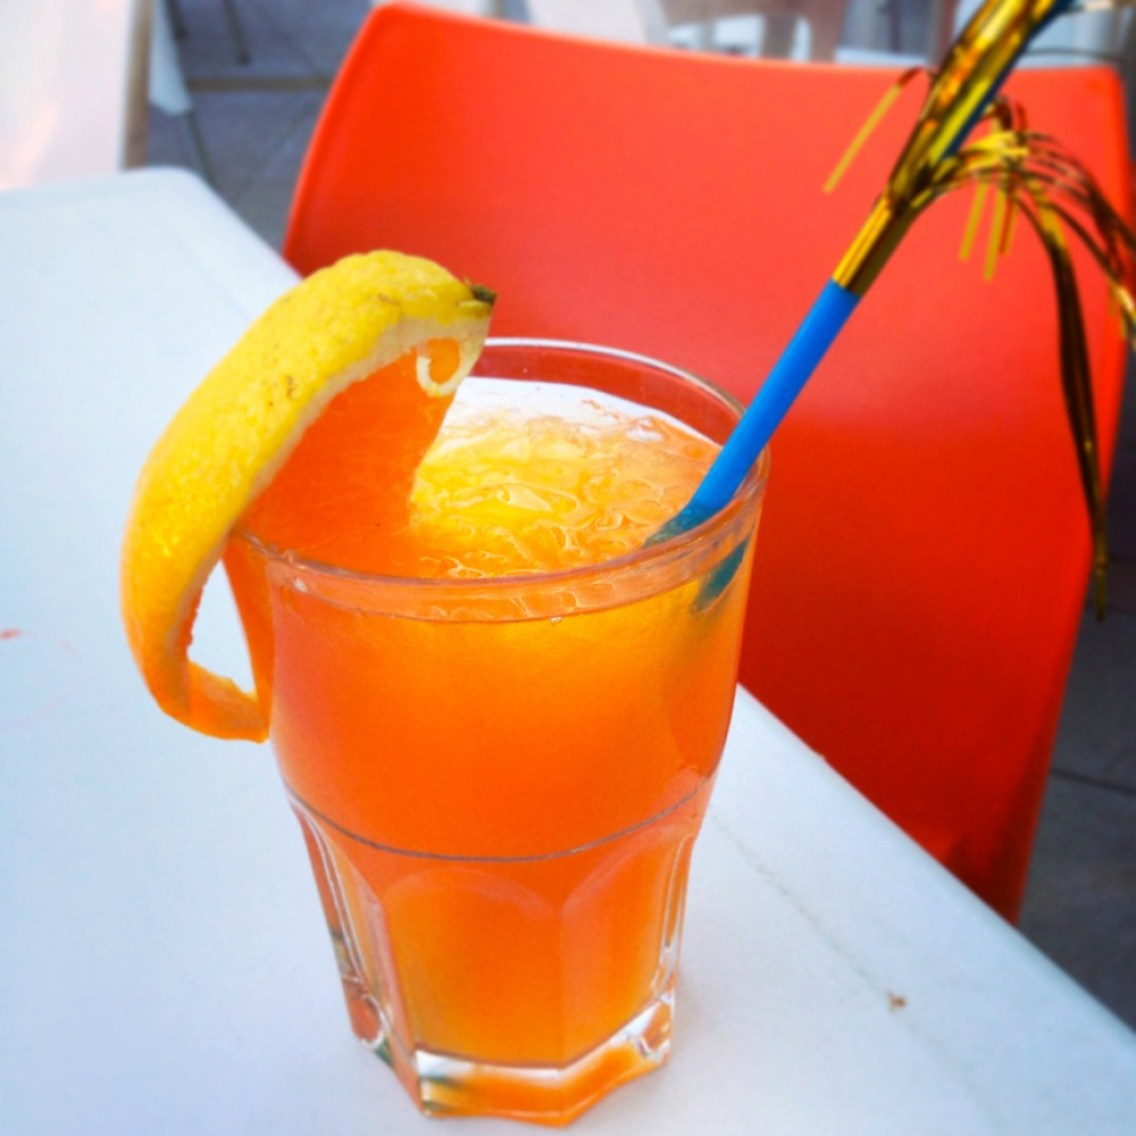 Cocktail Ariel Chico